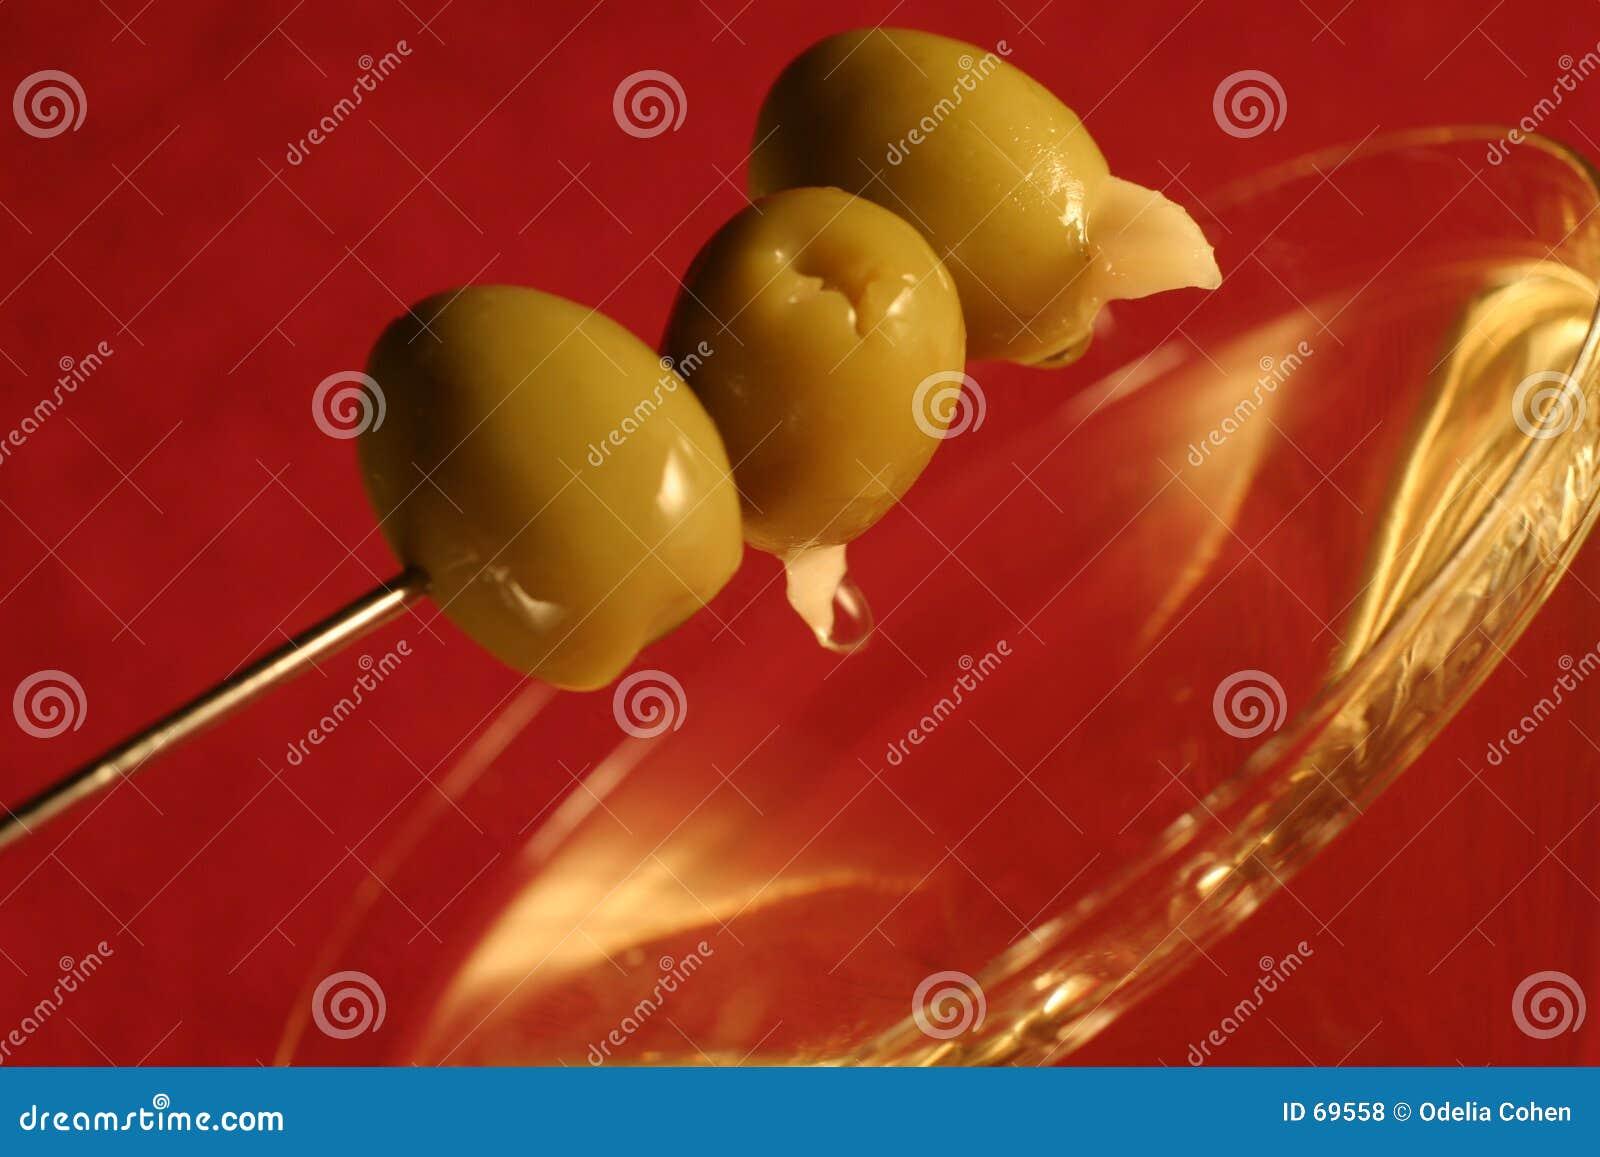 Martini olivgrön